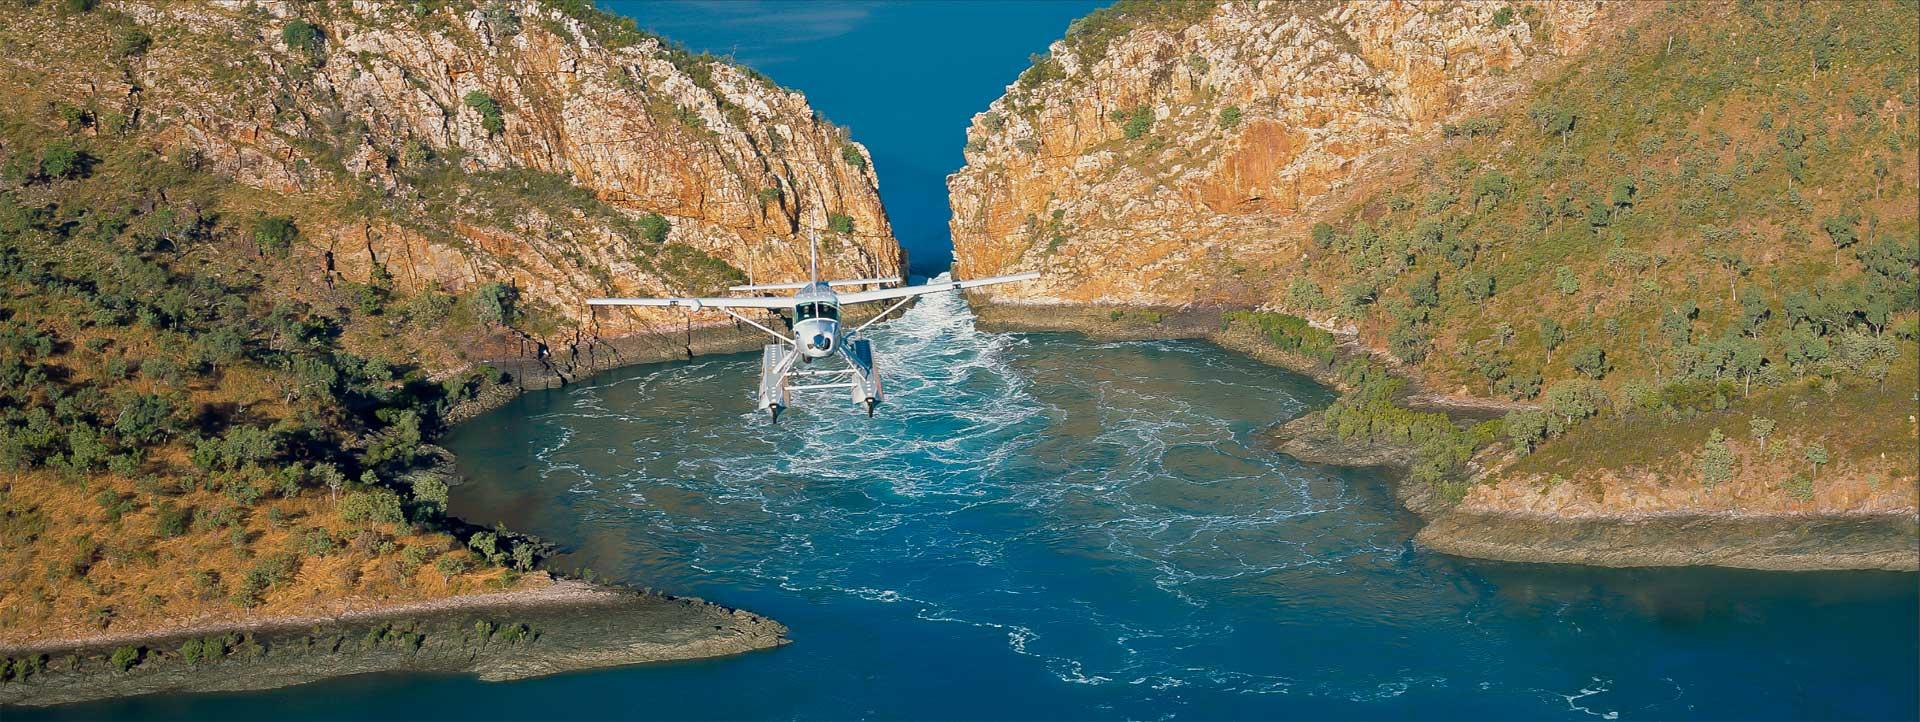 HORIZONTAL-FALLS-plane-flight-view-of-aircraft